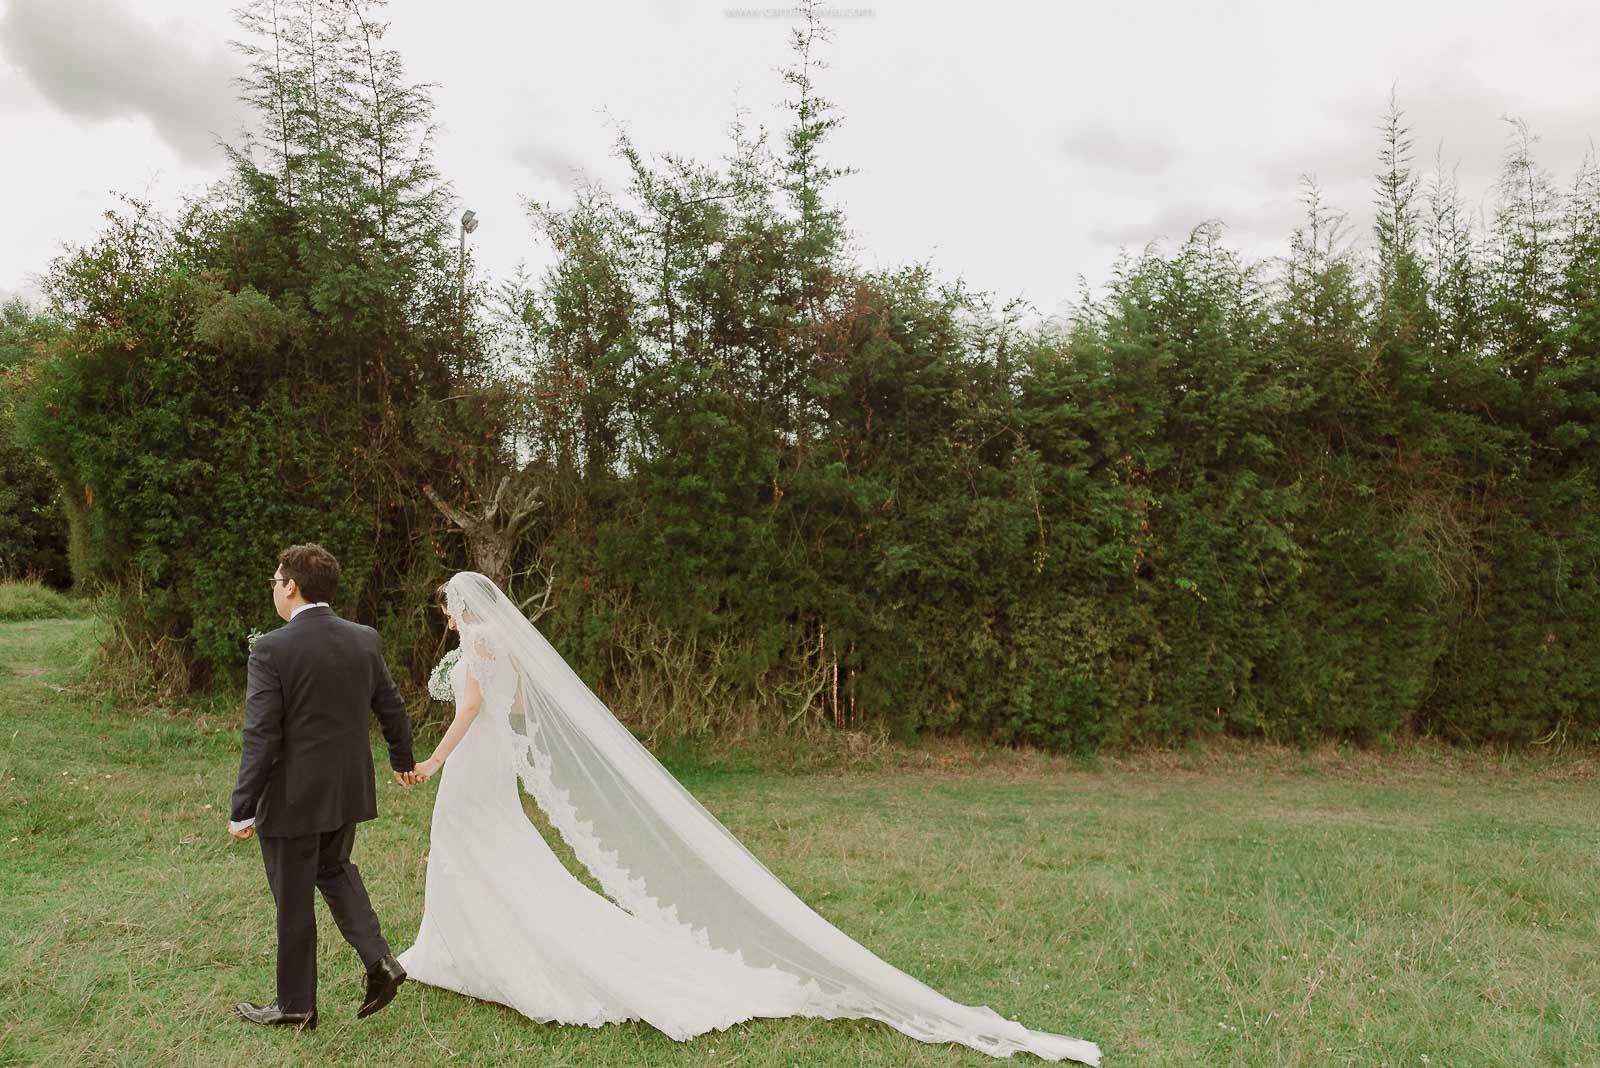 fotografo, bodas, paipa, estelar, fotos, matrimonios, boda, documental, decoracion, decoradora, planner, convenciones, boyaca, fotógrafo, boyacá, nivia, arbol-56